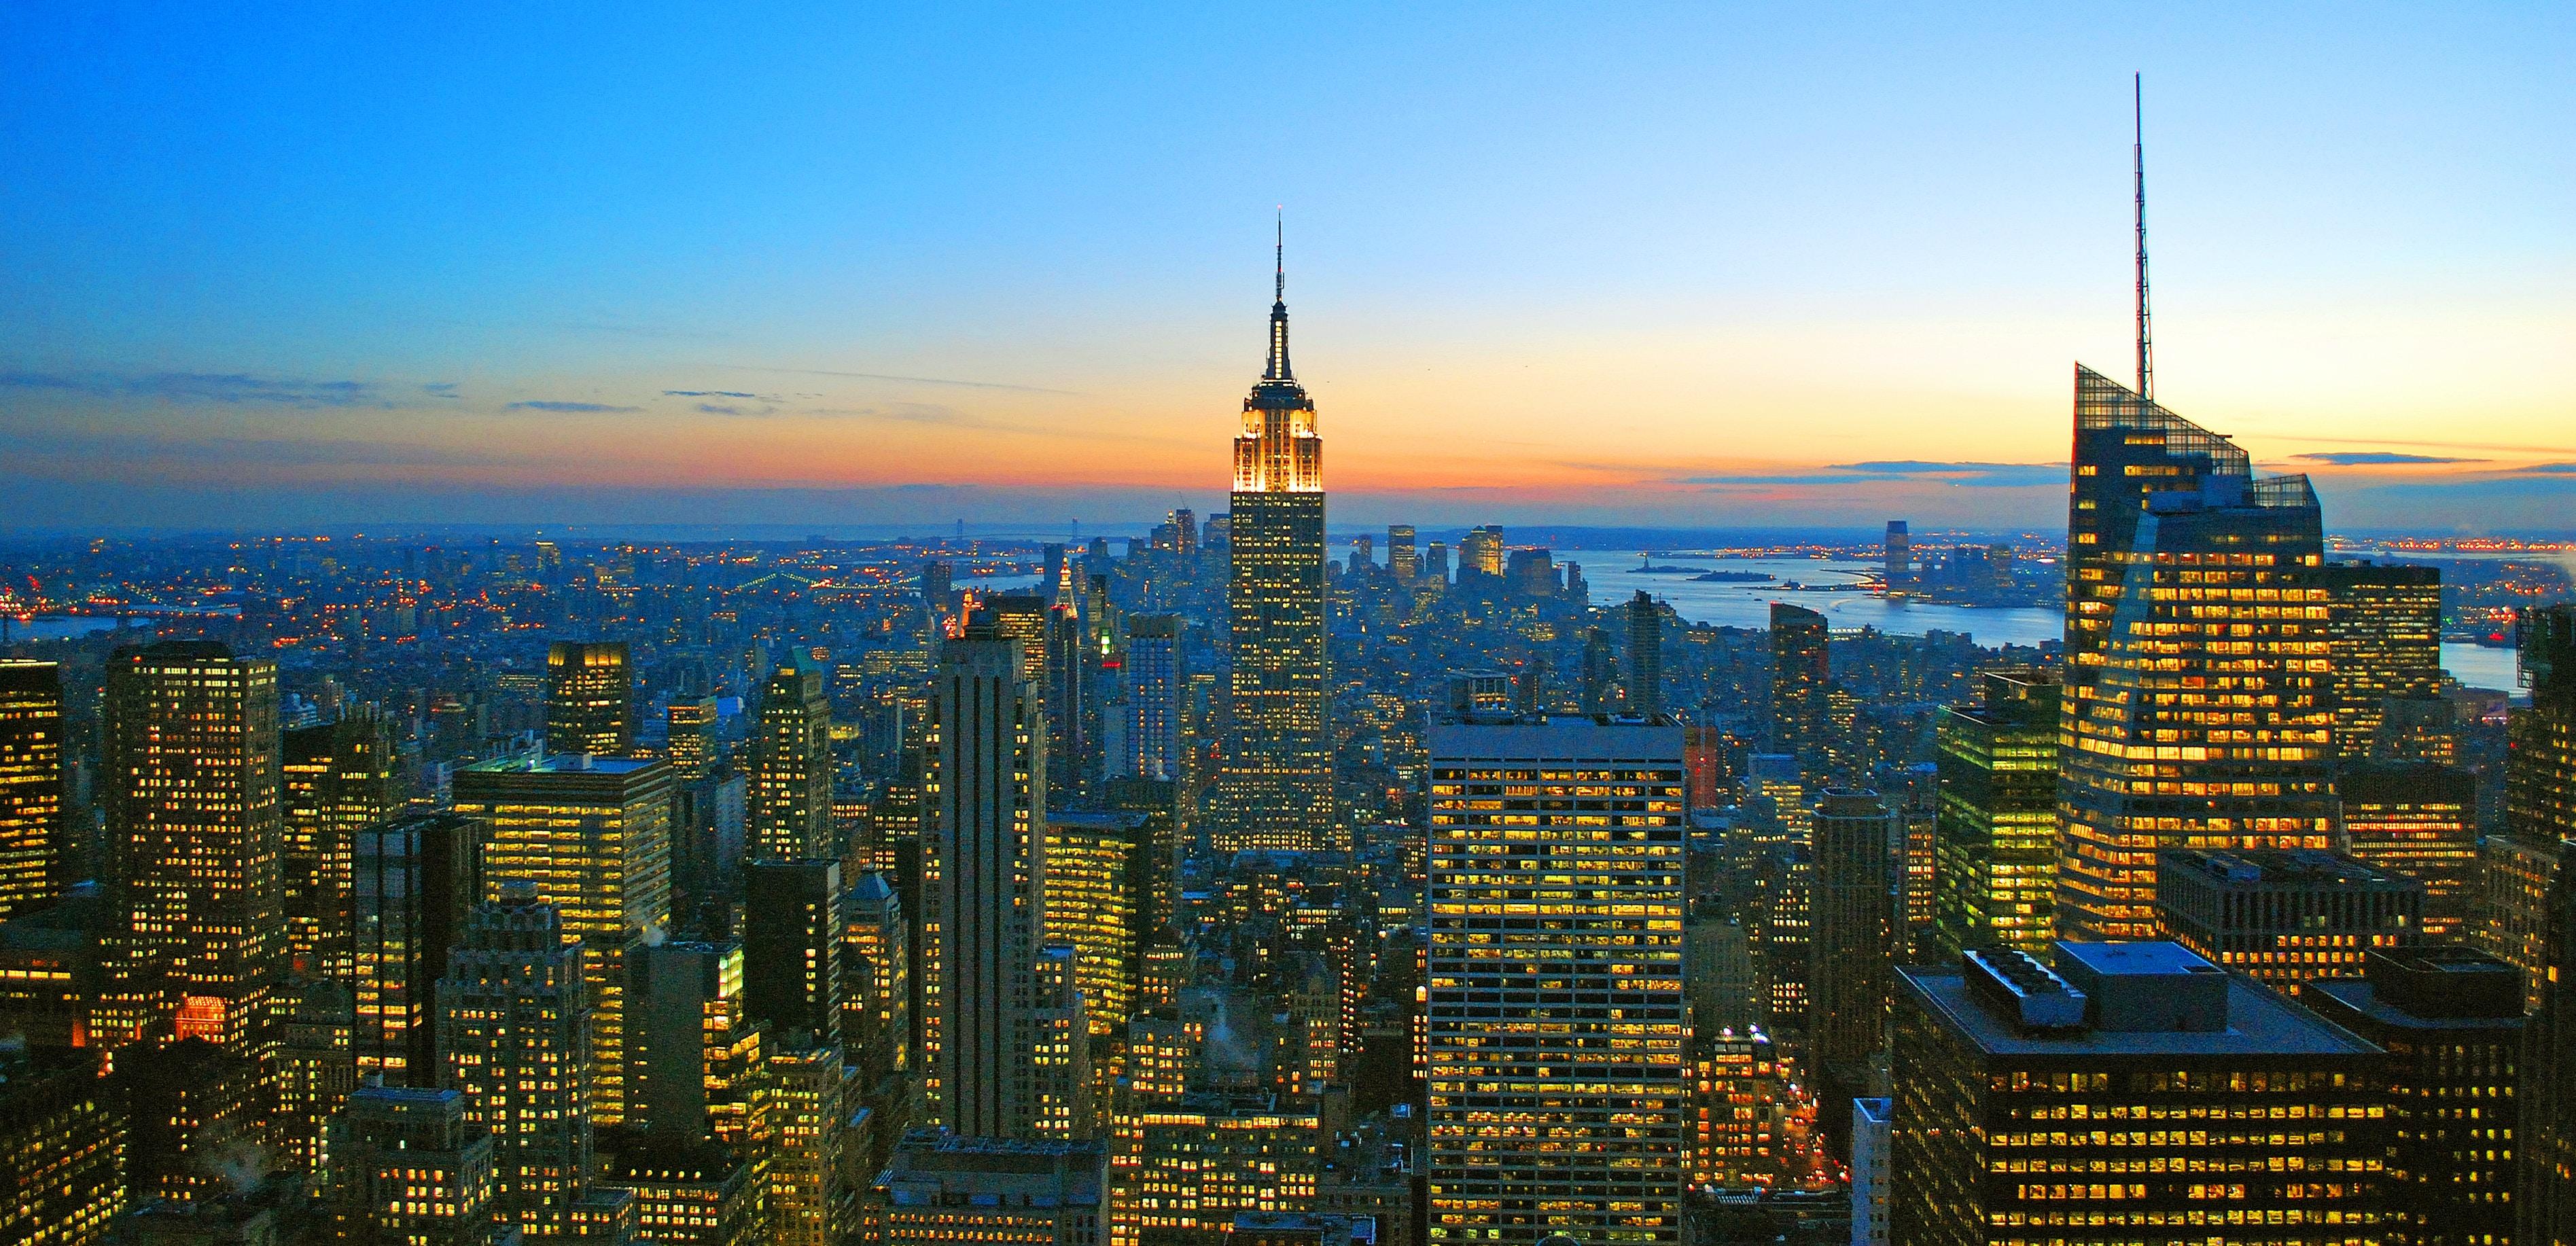 New York City skyline during sunset including the Chrysler building